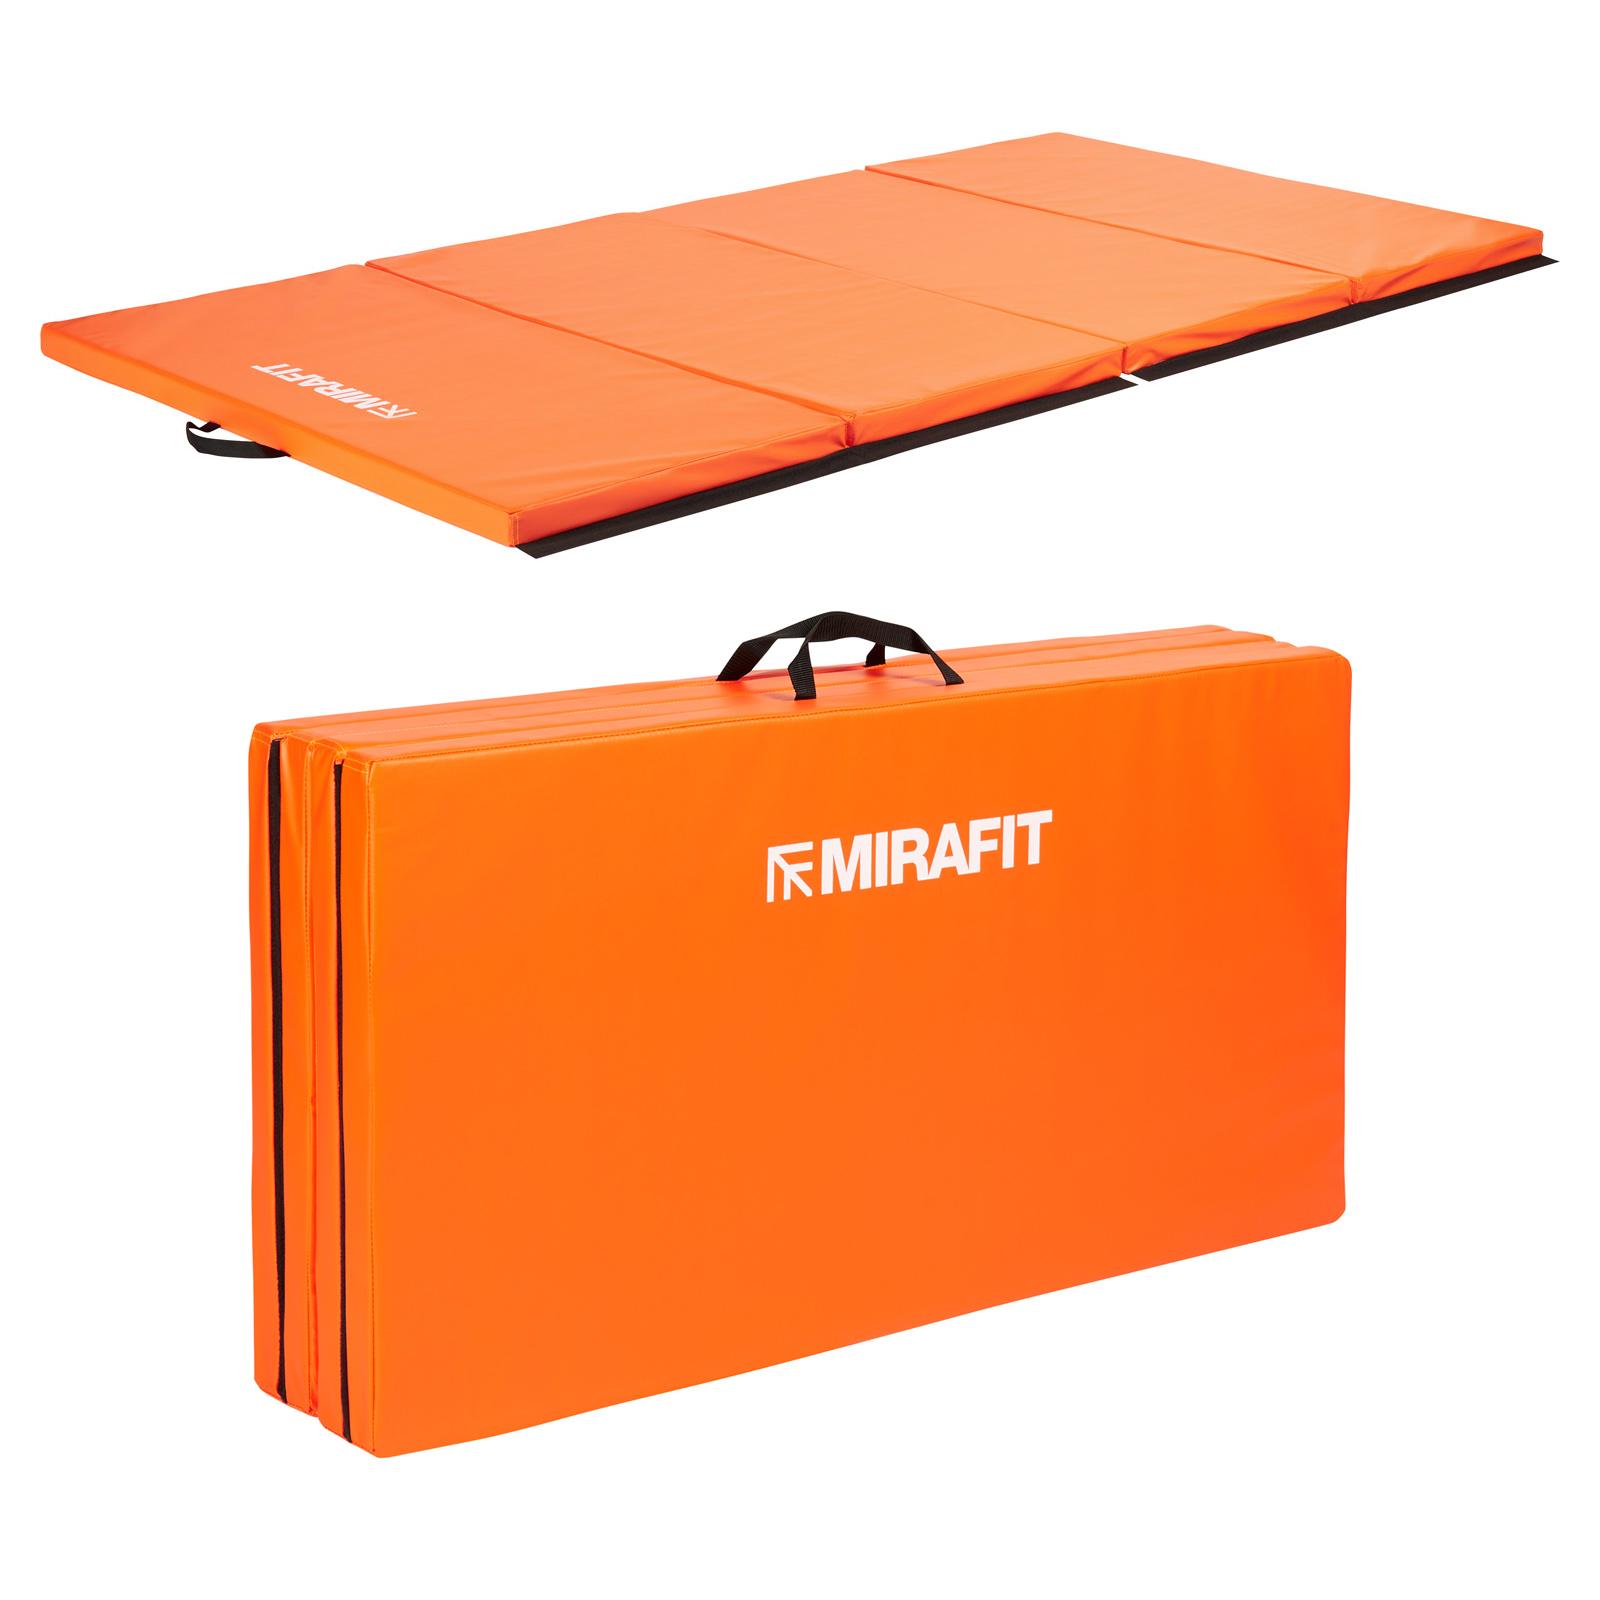 Mirafit Grande Tapis De Sol Exercice Fitness Pilates Yoga Pliable